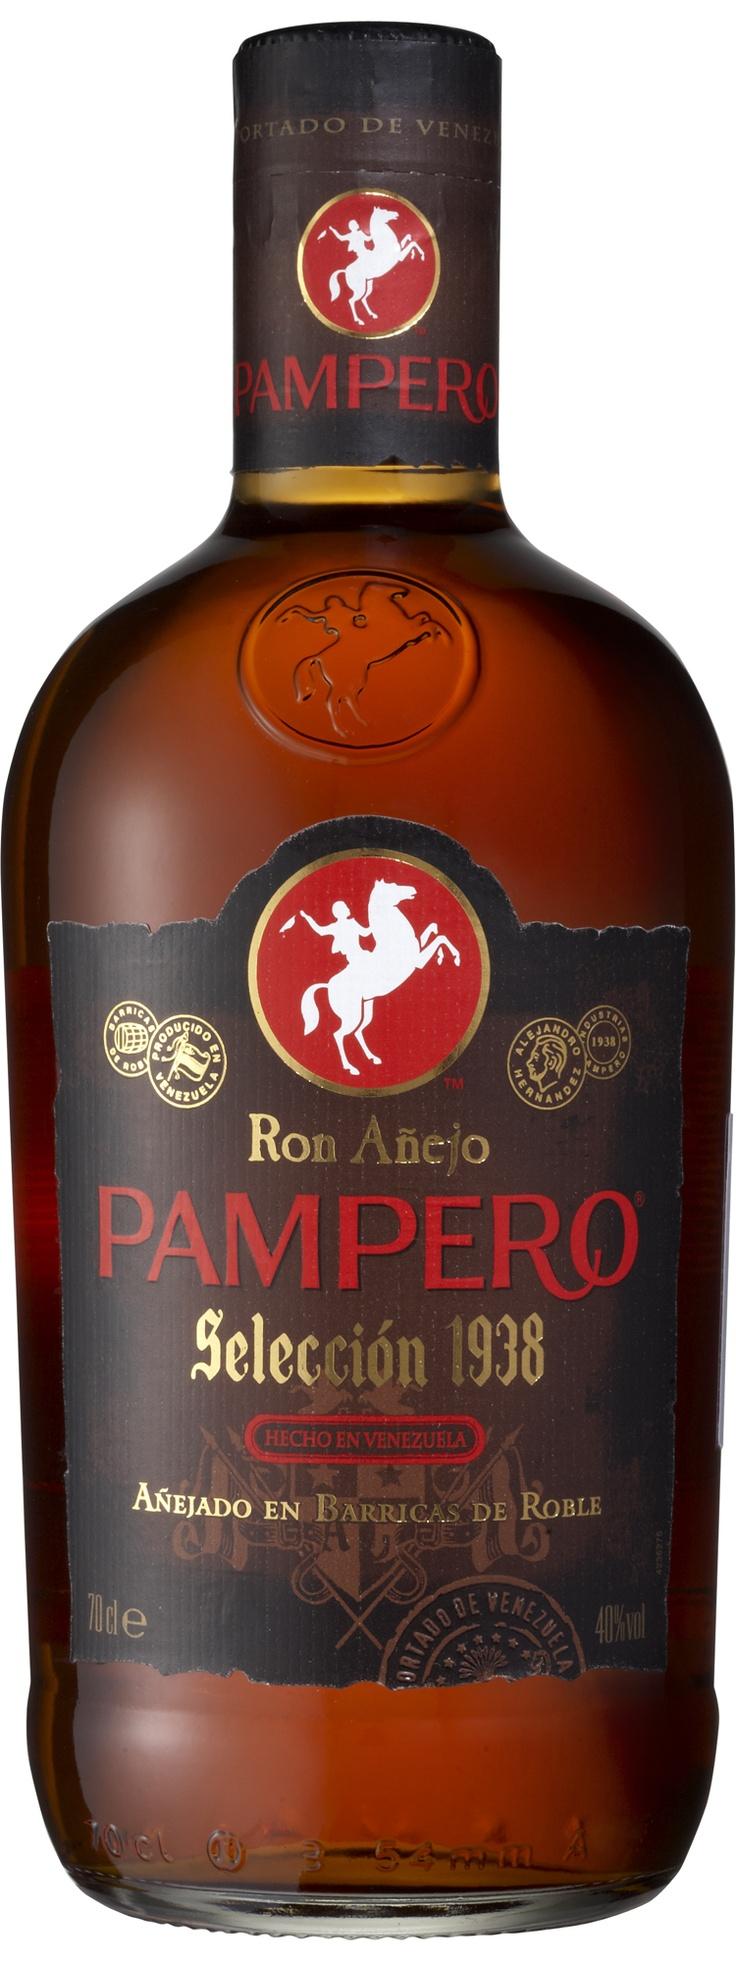 Ron Añejo Pampero Rum | Dan Murphy's | Buy Wine, Champagne, Beer & Spirits Online